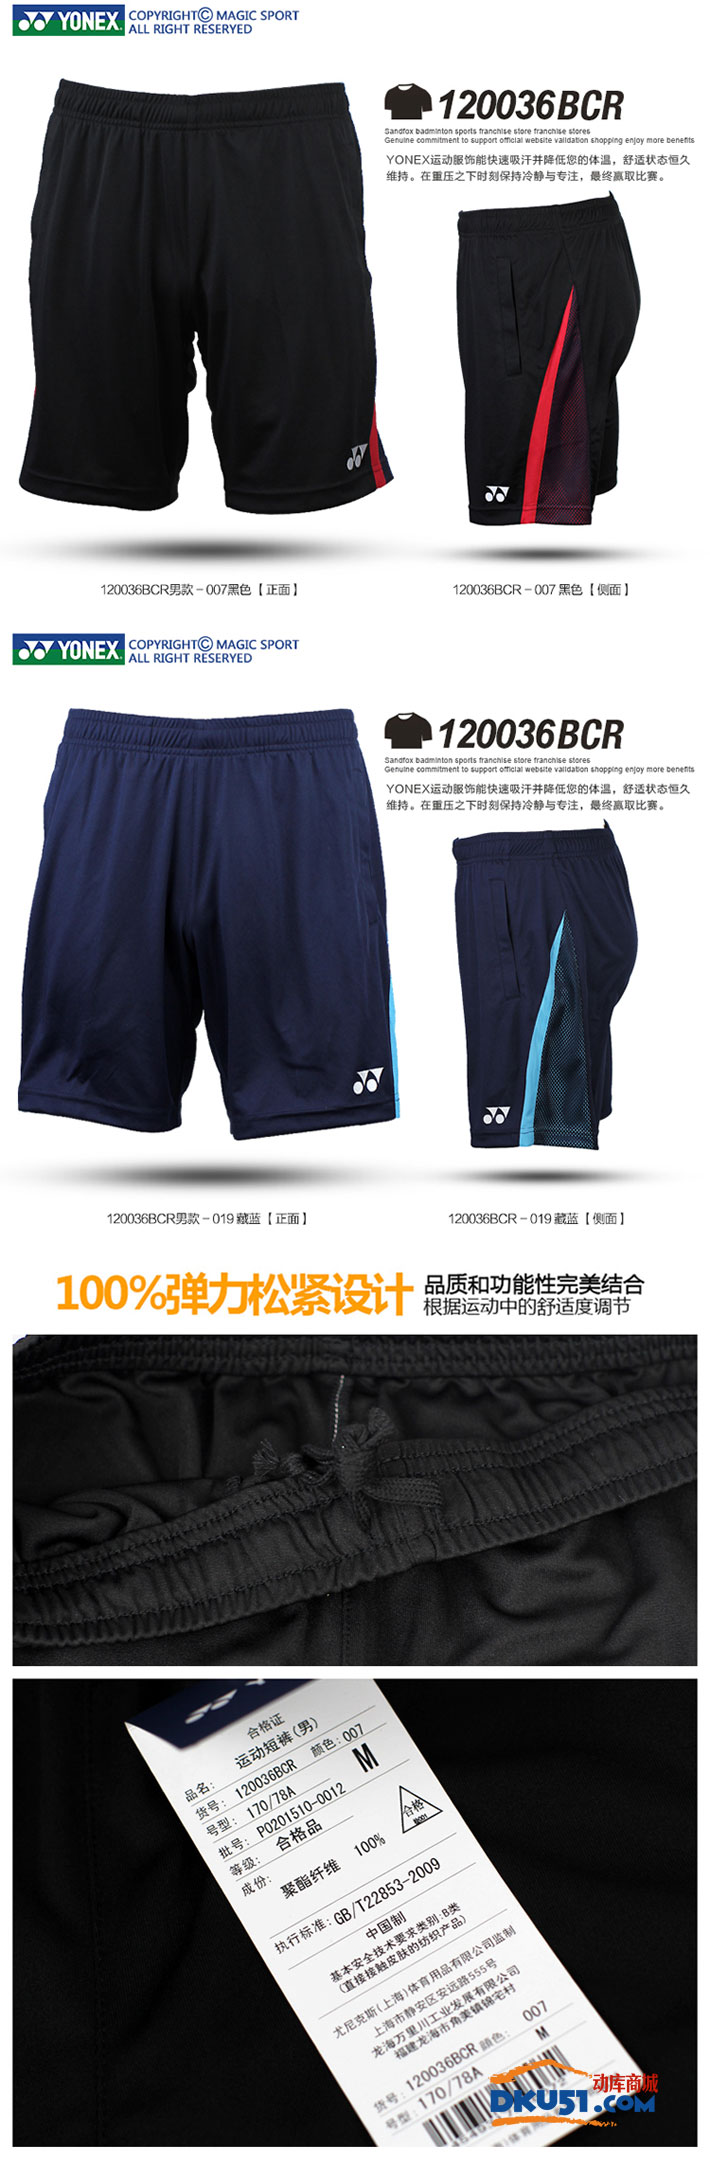 YONEX尤尼克斯YY 120036BCR 男款羽毛球短褲